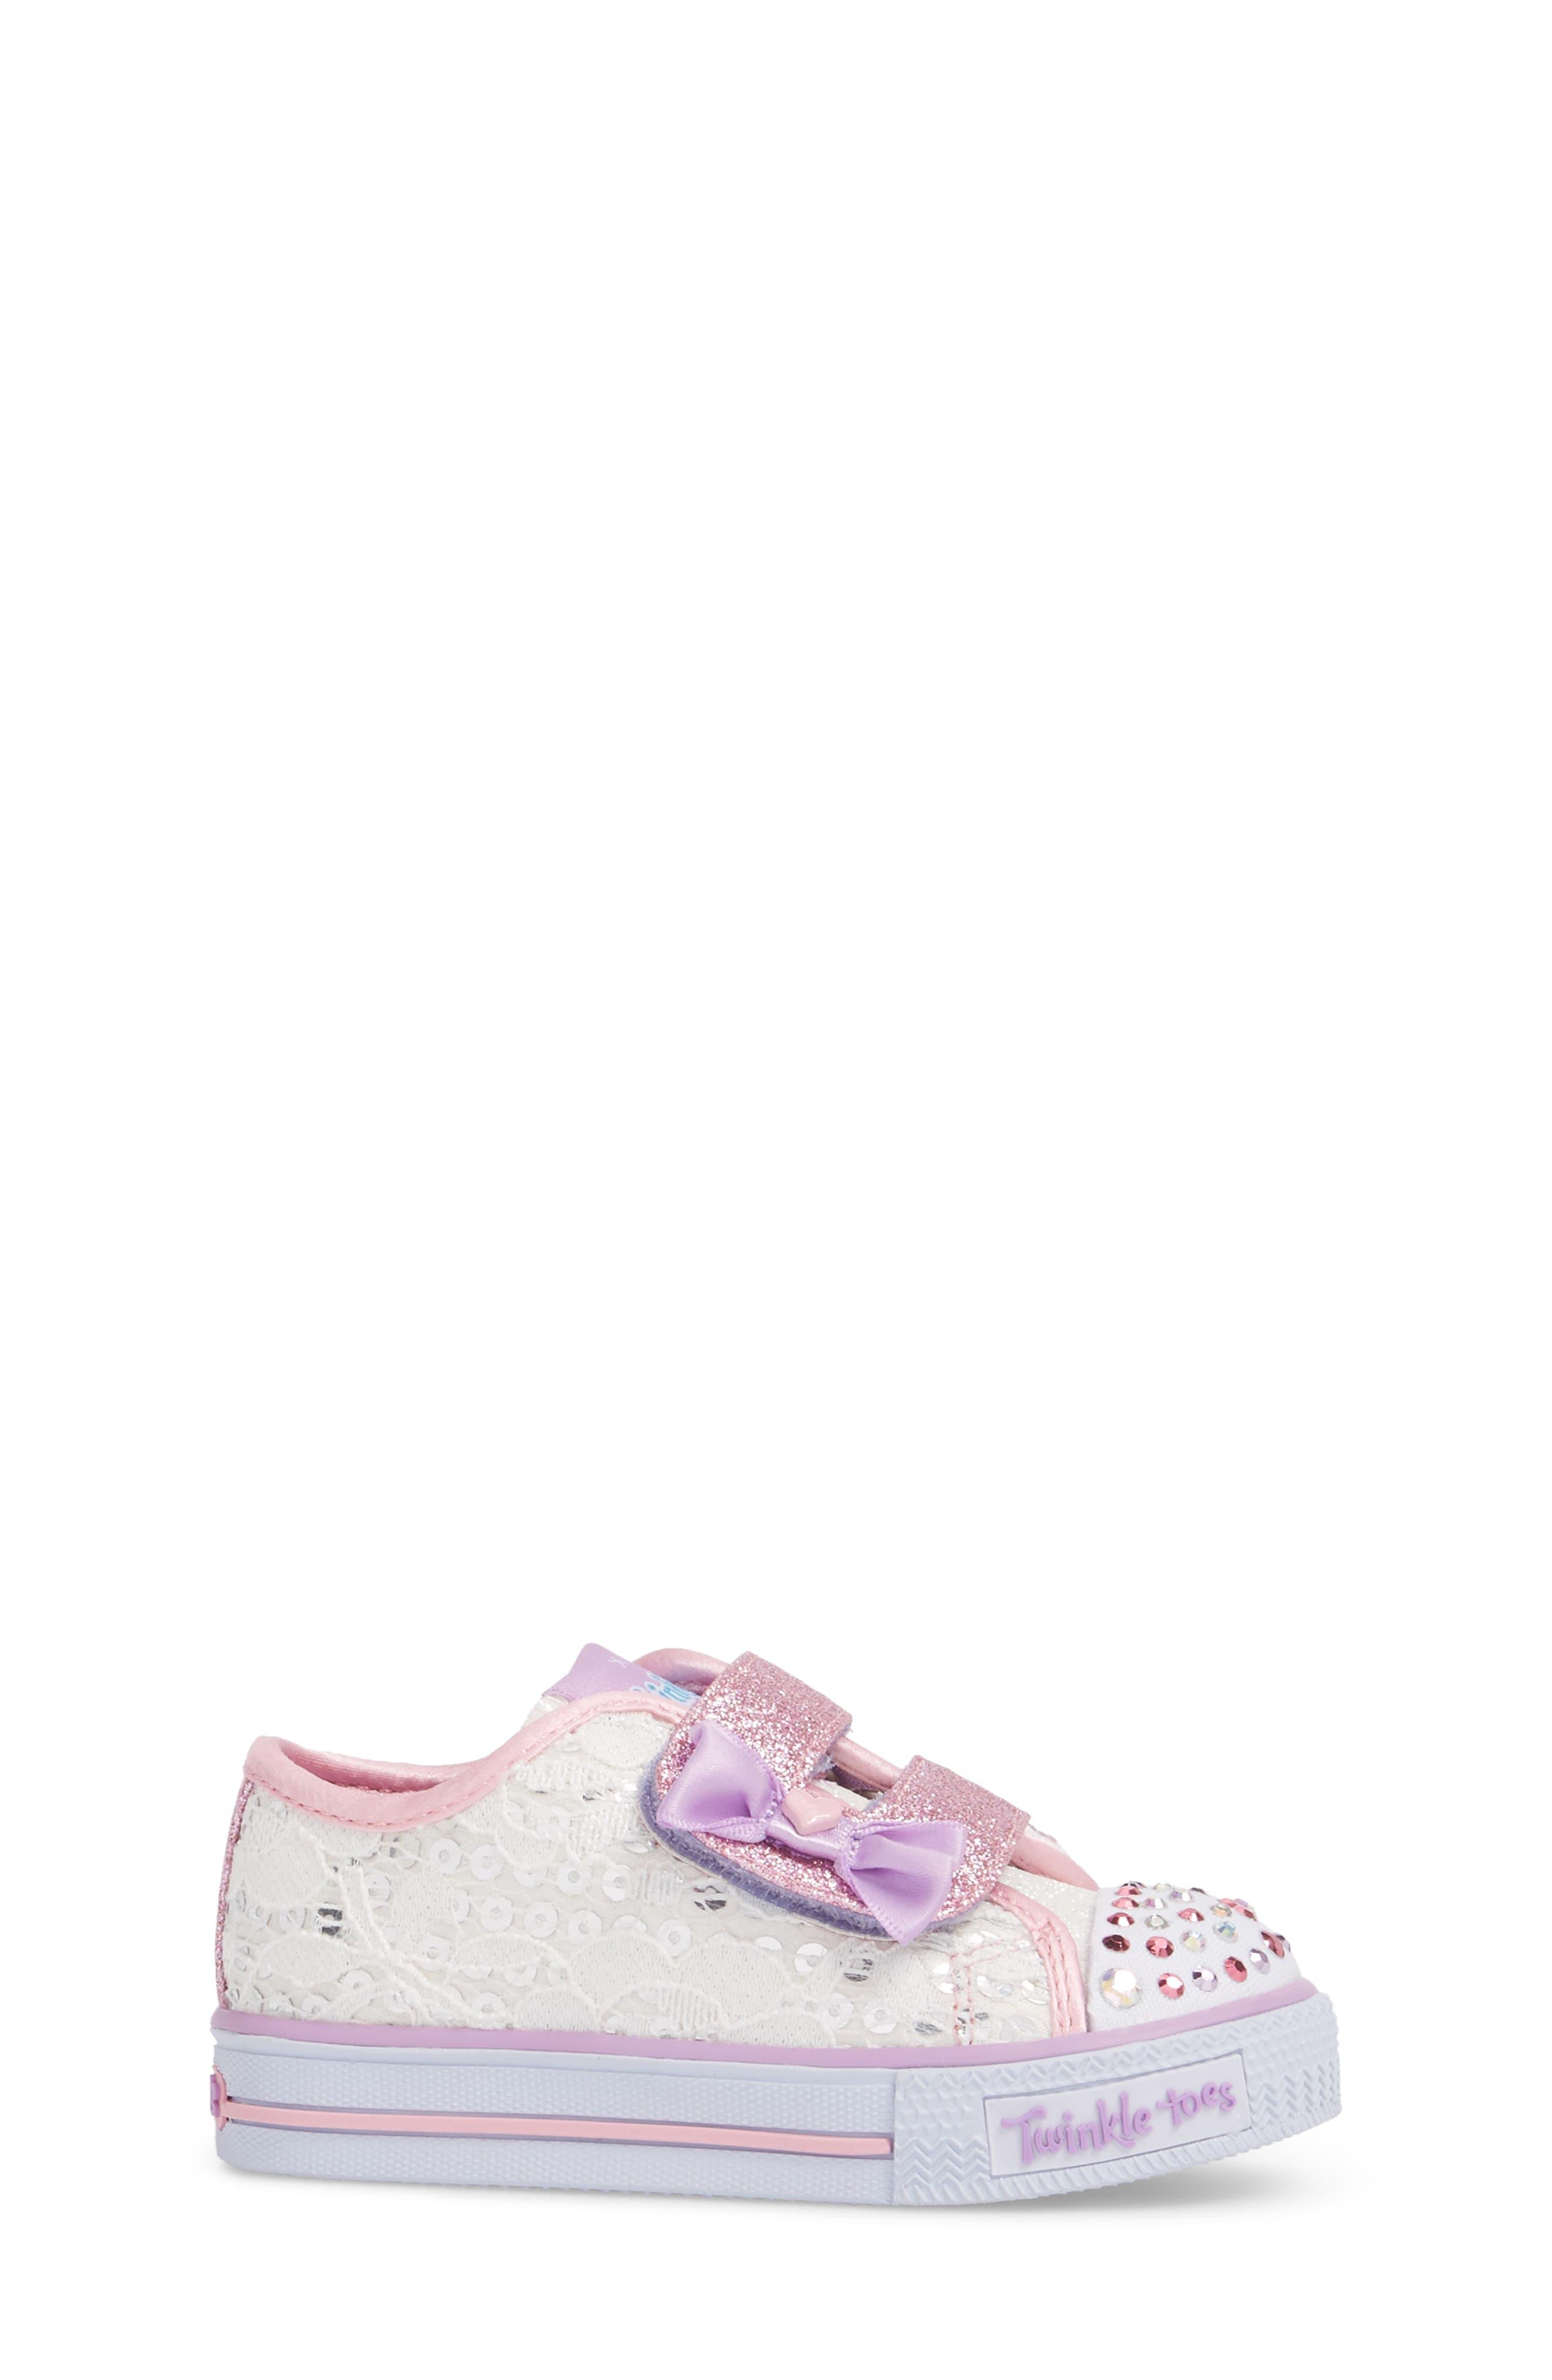 Twinkle Toes Shuffles Light-Up Glitter Sneaker,                             Alternate thumbnail 3, color,                             White/ Silver/ Light Pink